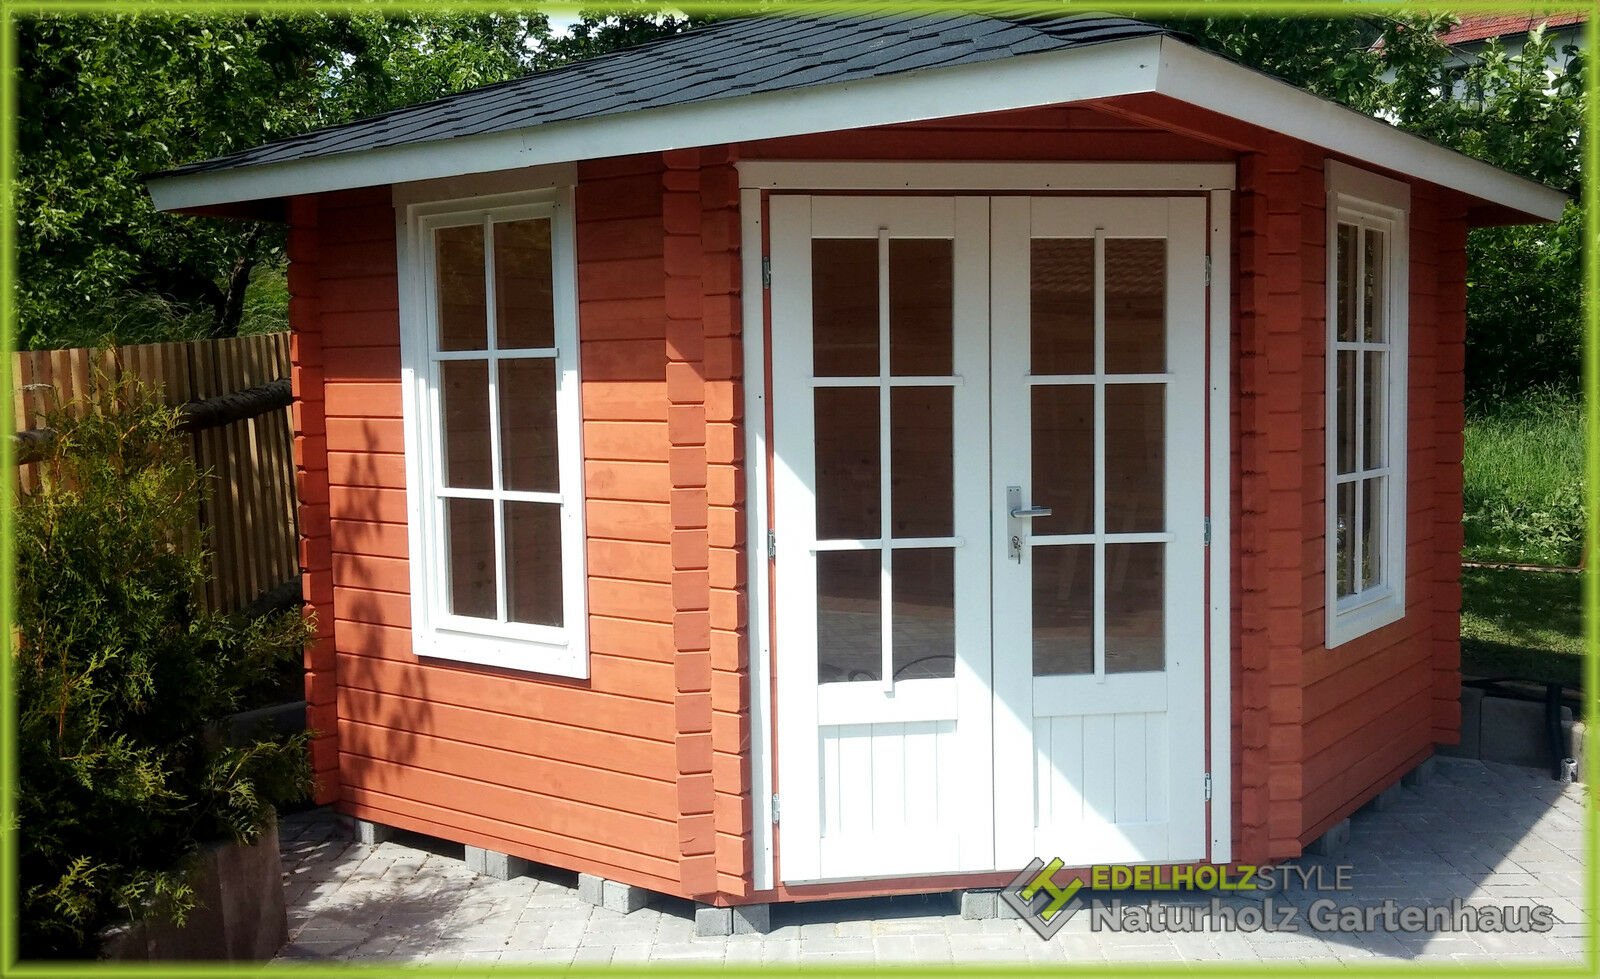 5-eck gartenhaus blockhaus, pavillon 3x3m 5-eckige aus holz, 40mm